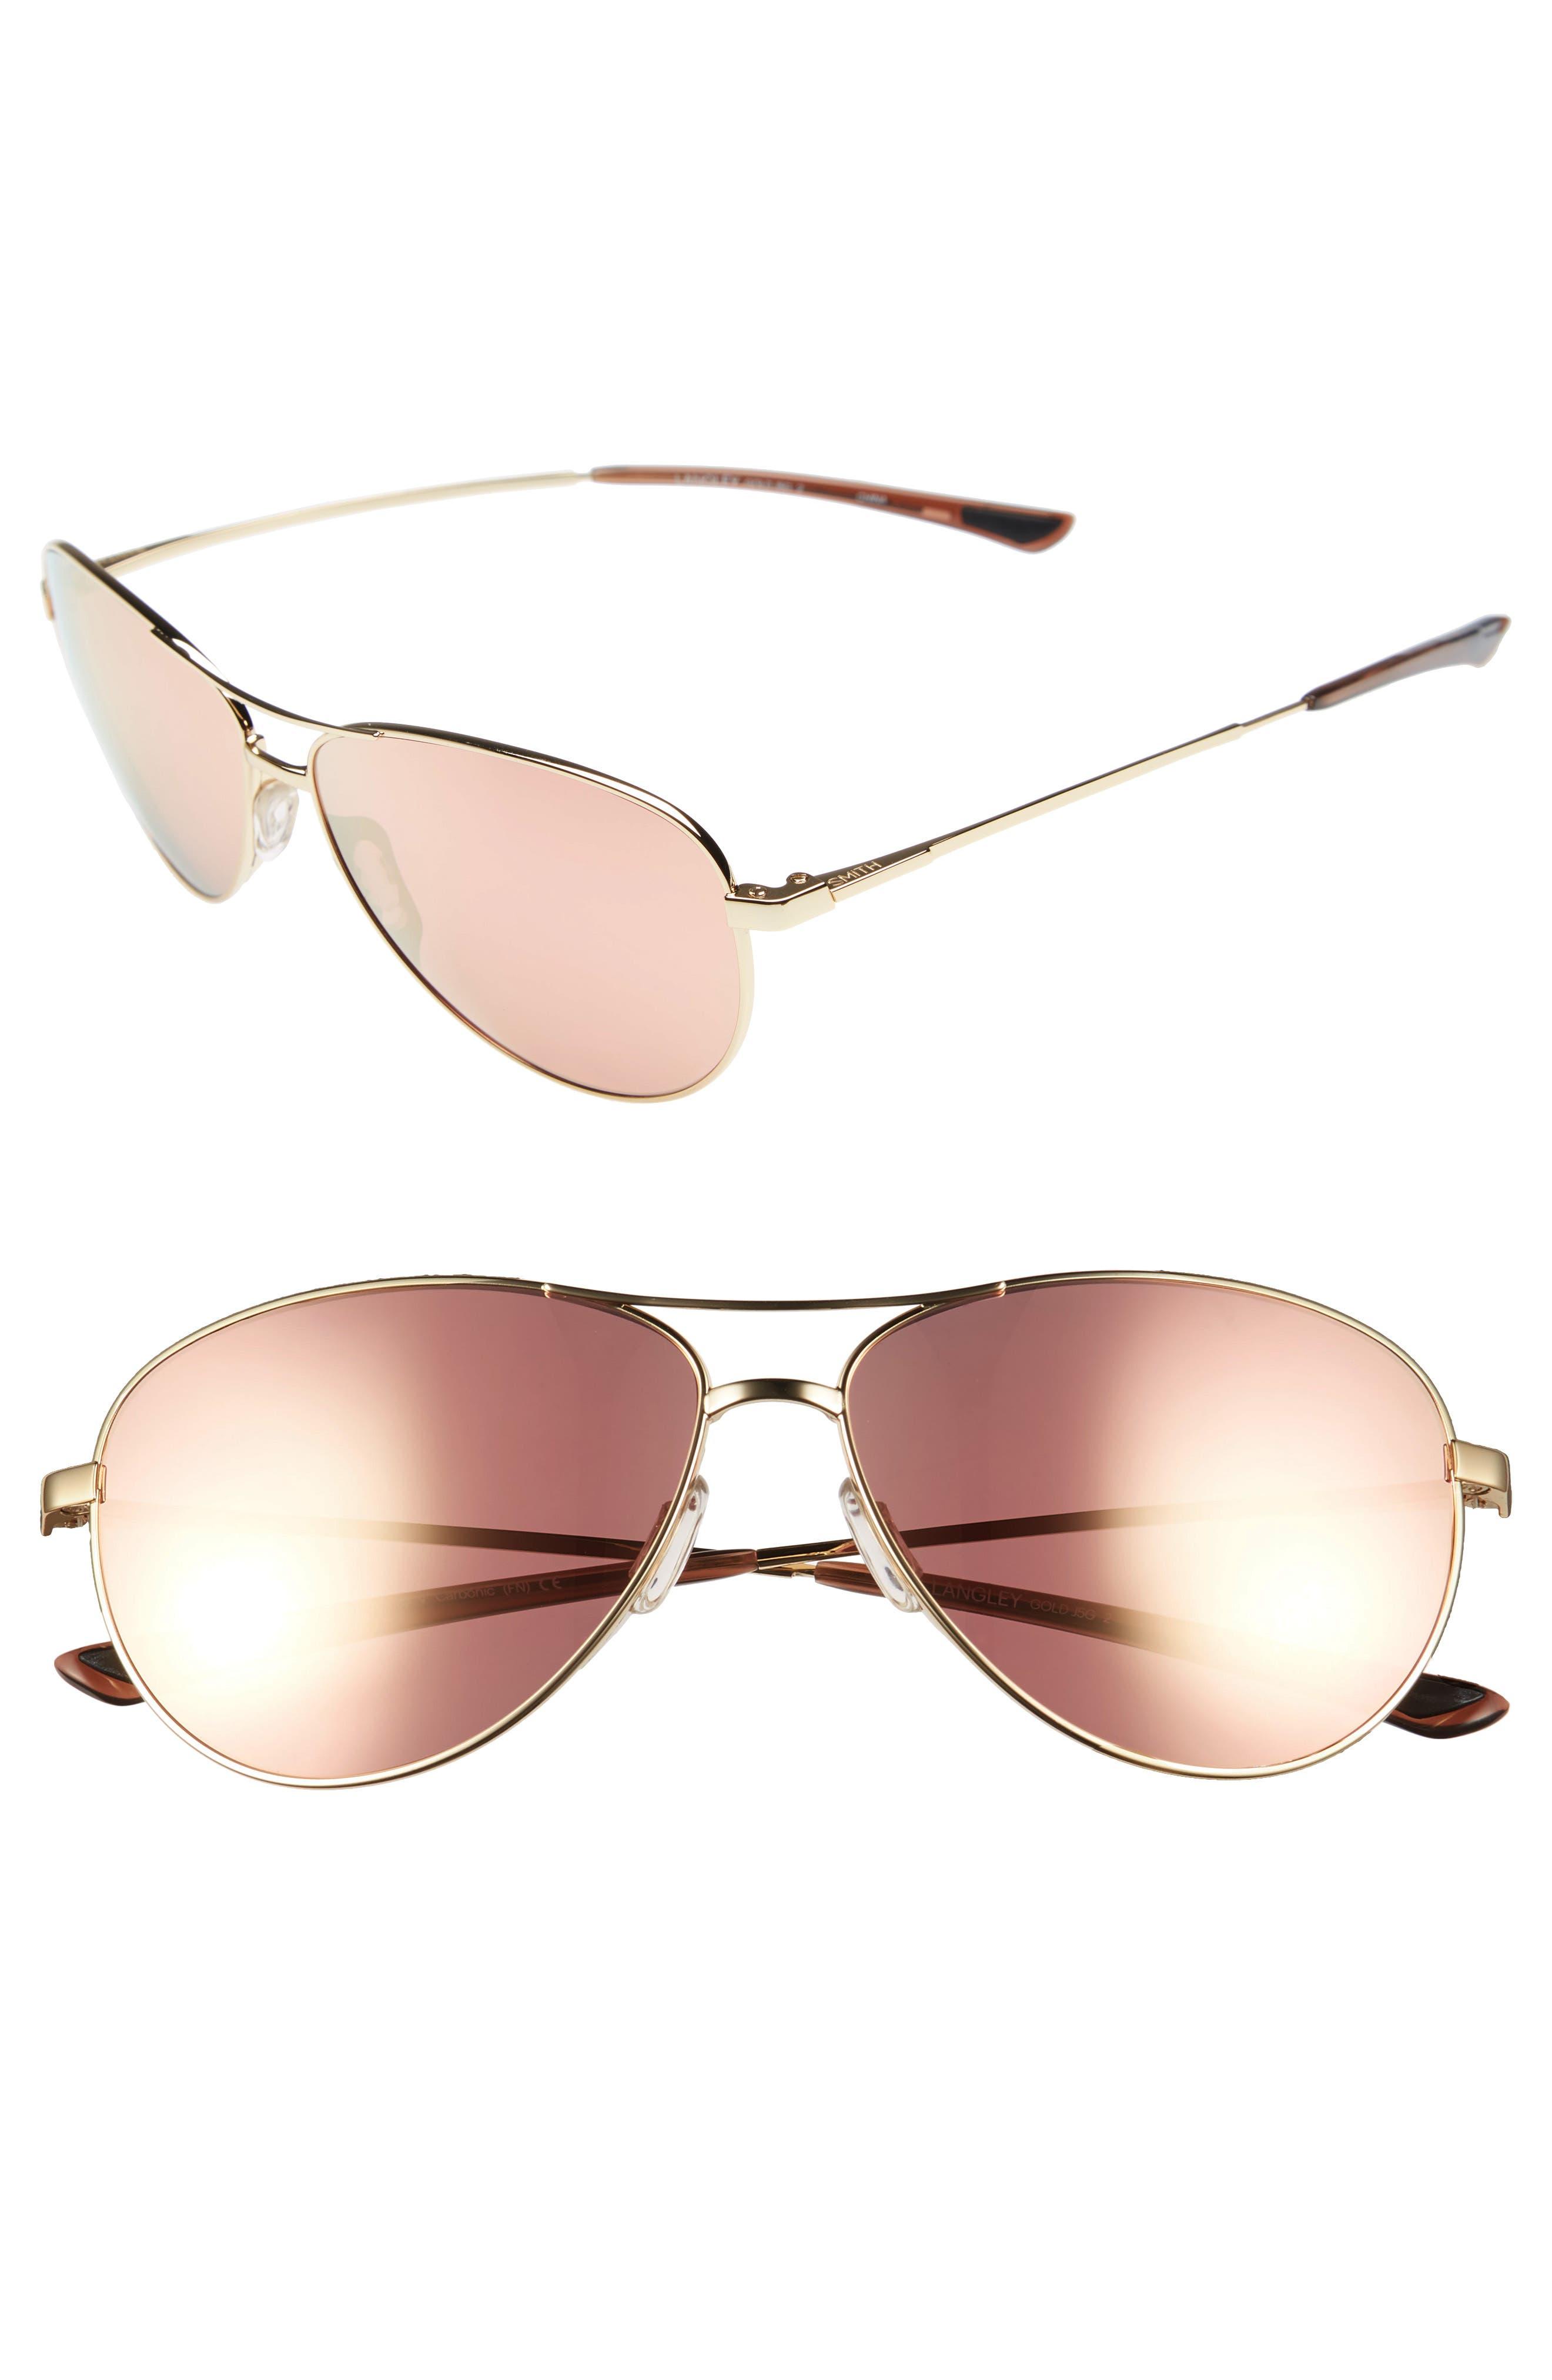 SMITH 'Langley' 60mm Aviator Sunglasses, Main, color, GOLD